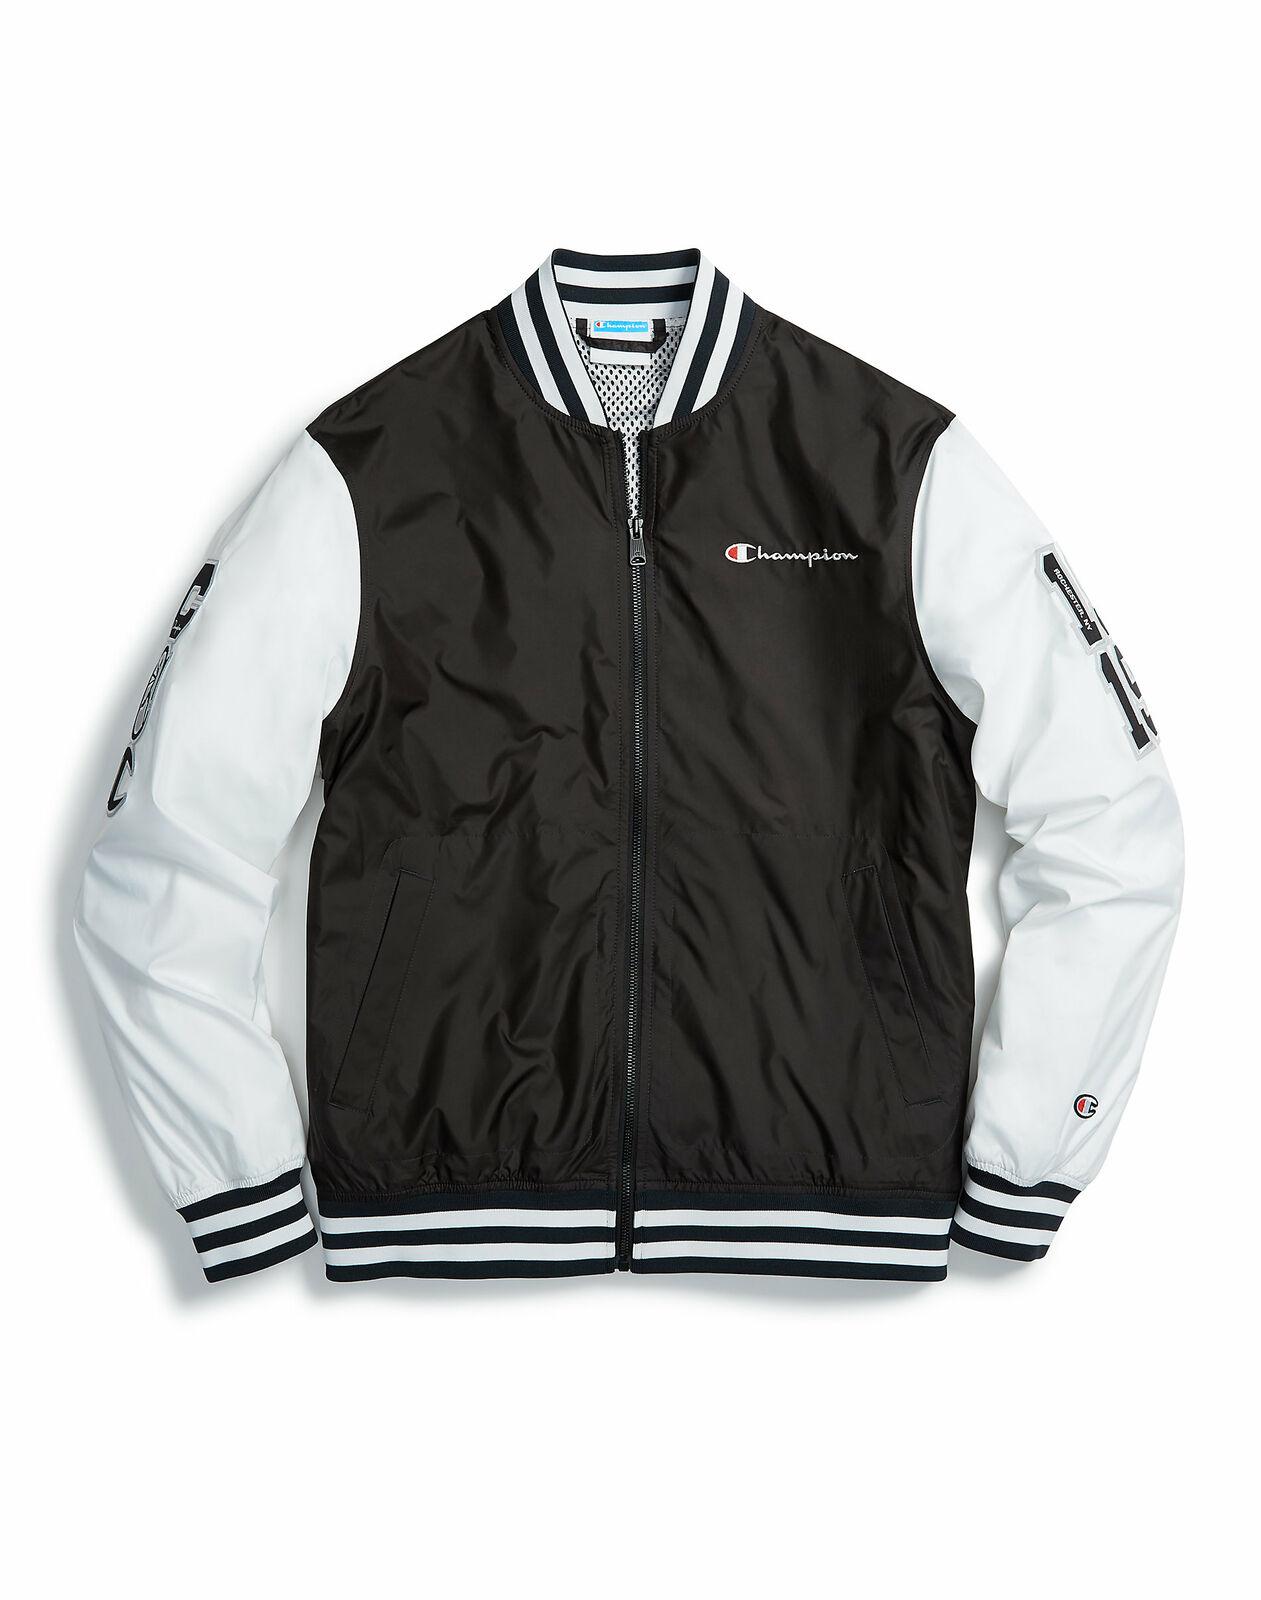 Nautica Mens Logo Track Jacket XS for sale online | eBay